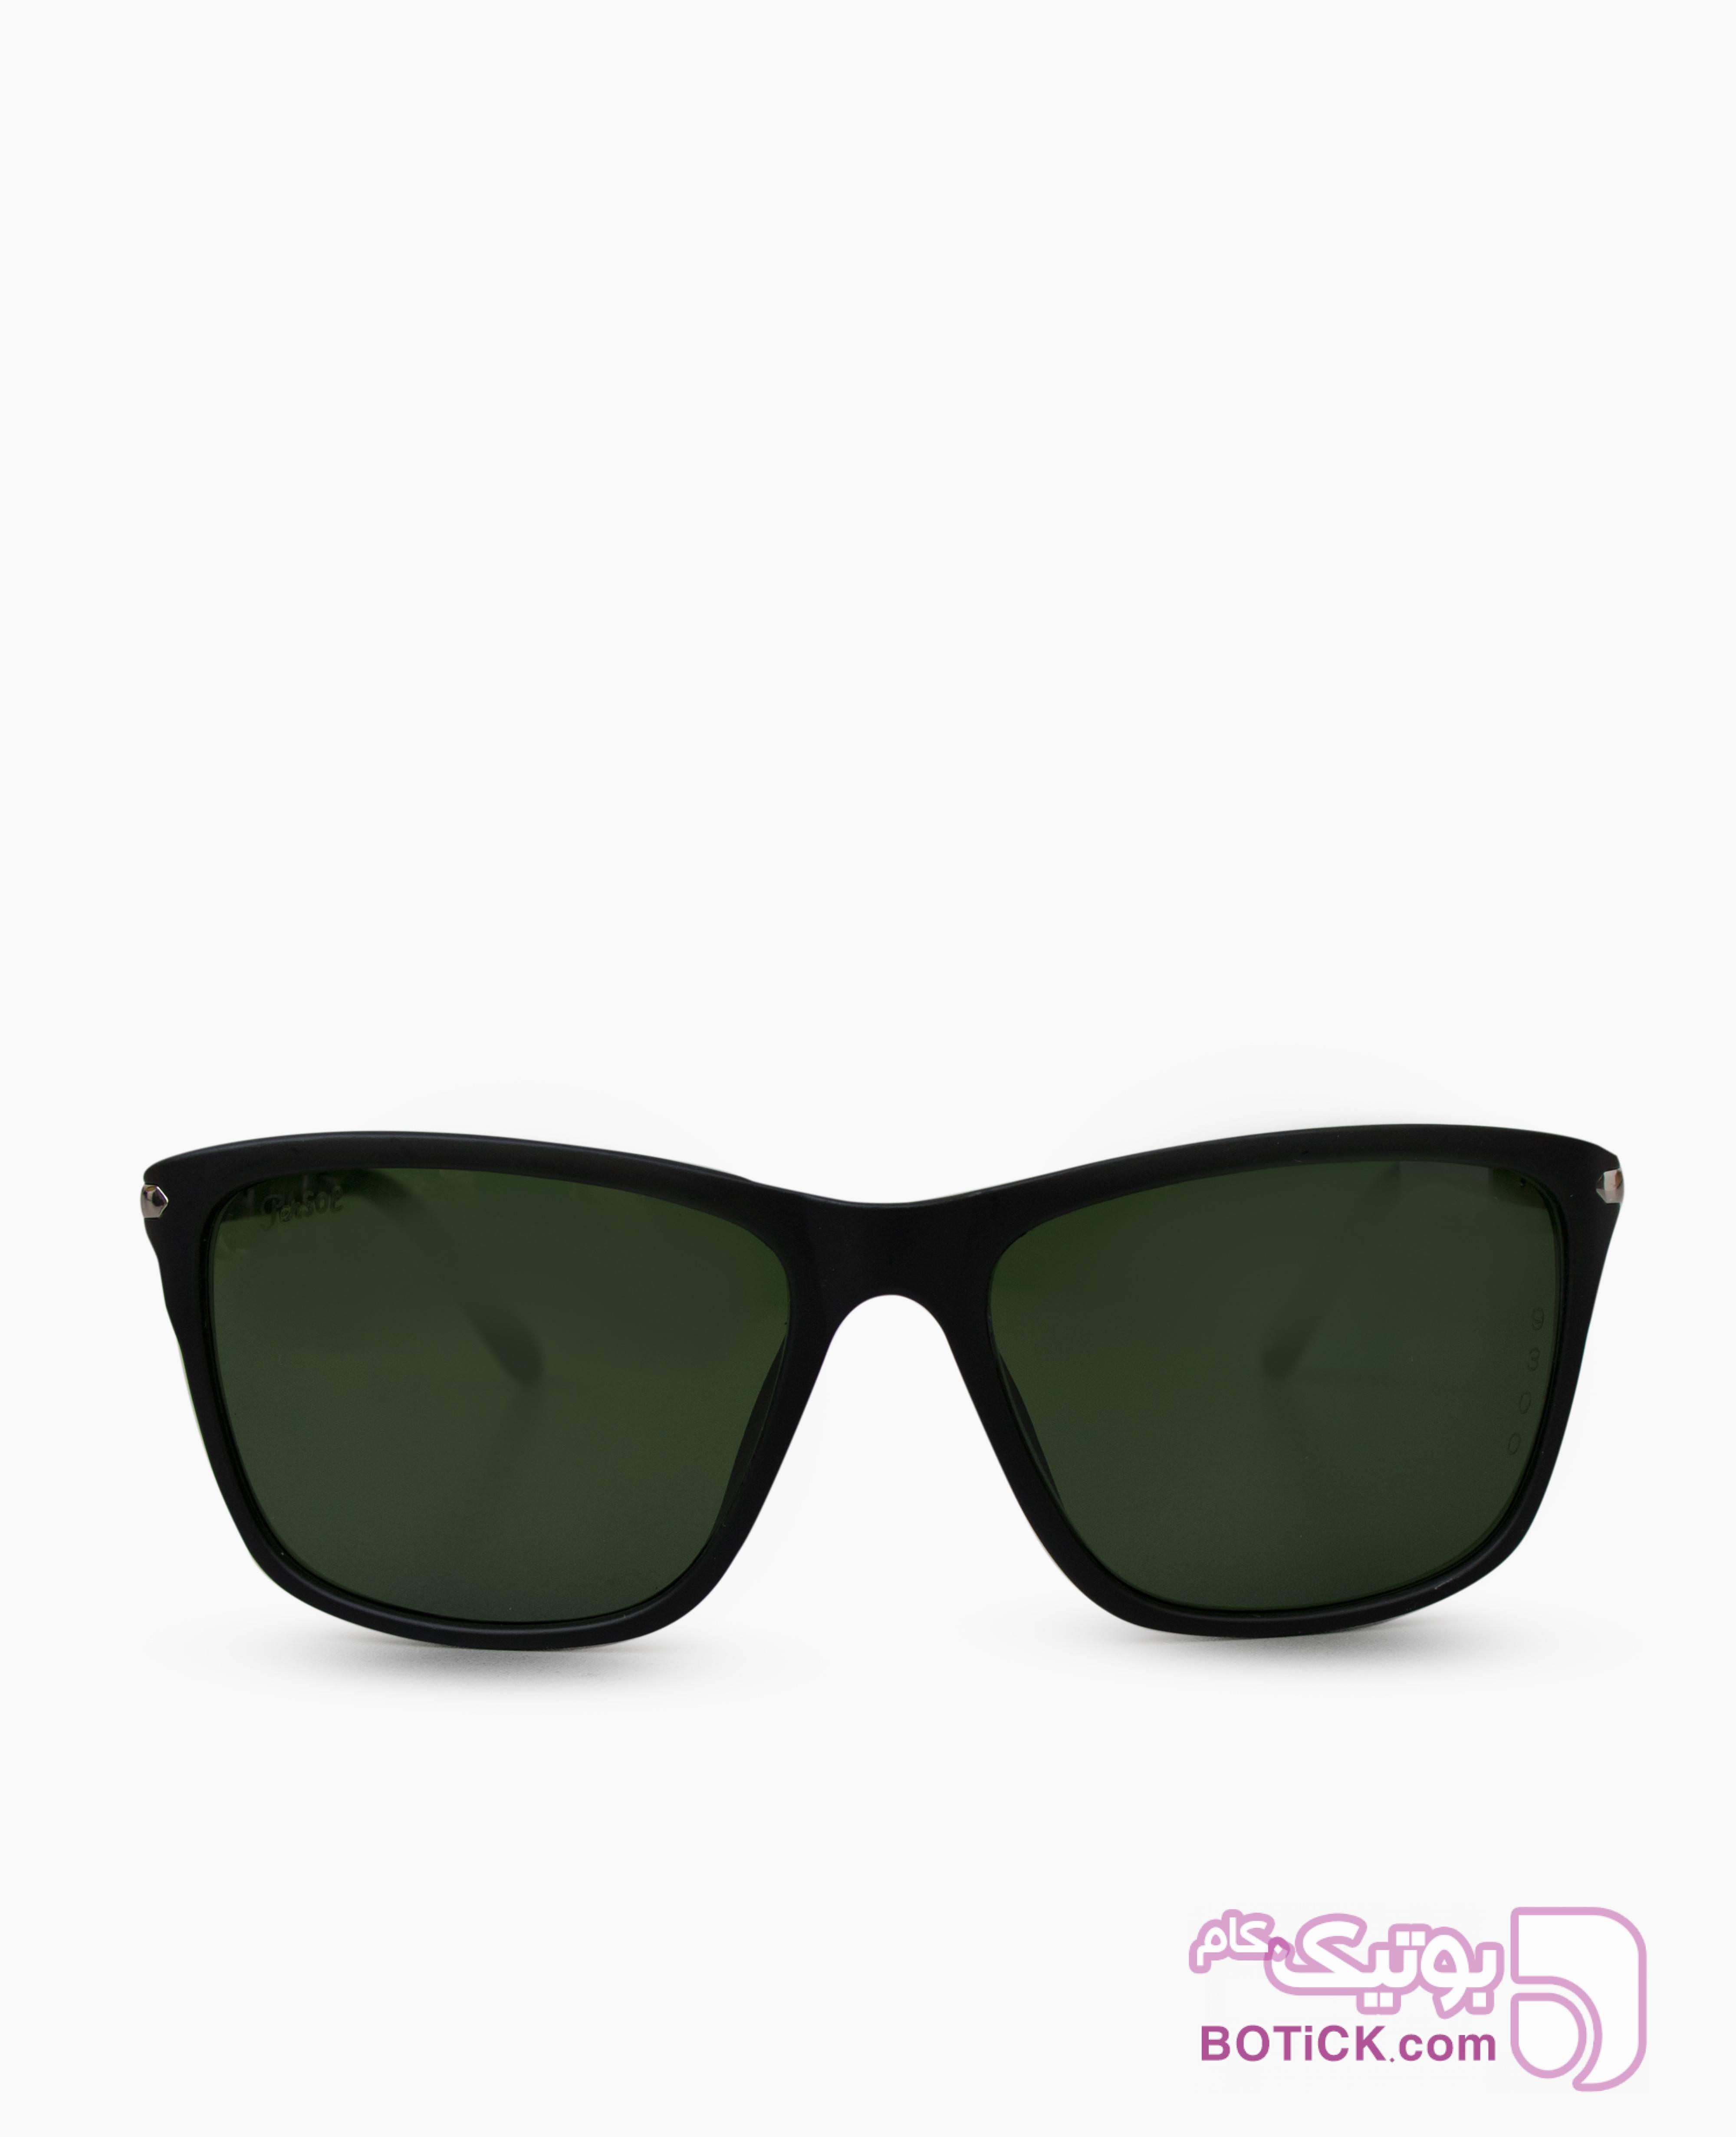 عینک آفتابی PERSOL کد 9300 مشکی عینک آفتابی